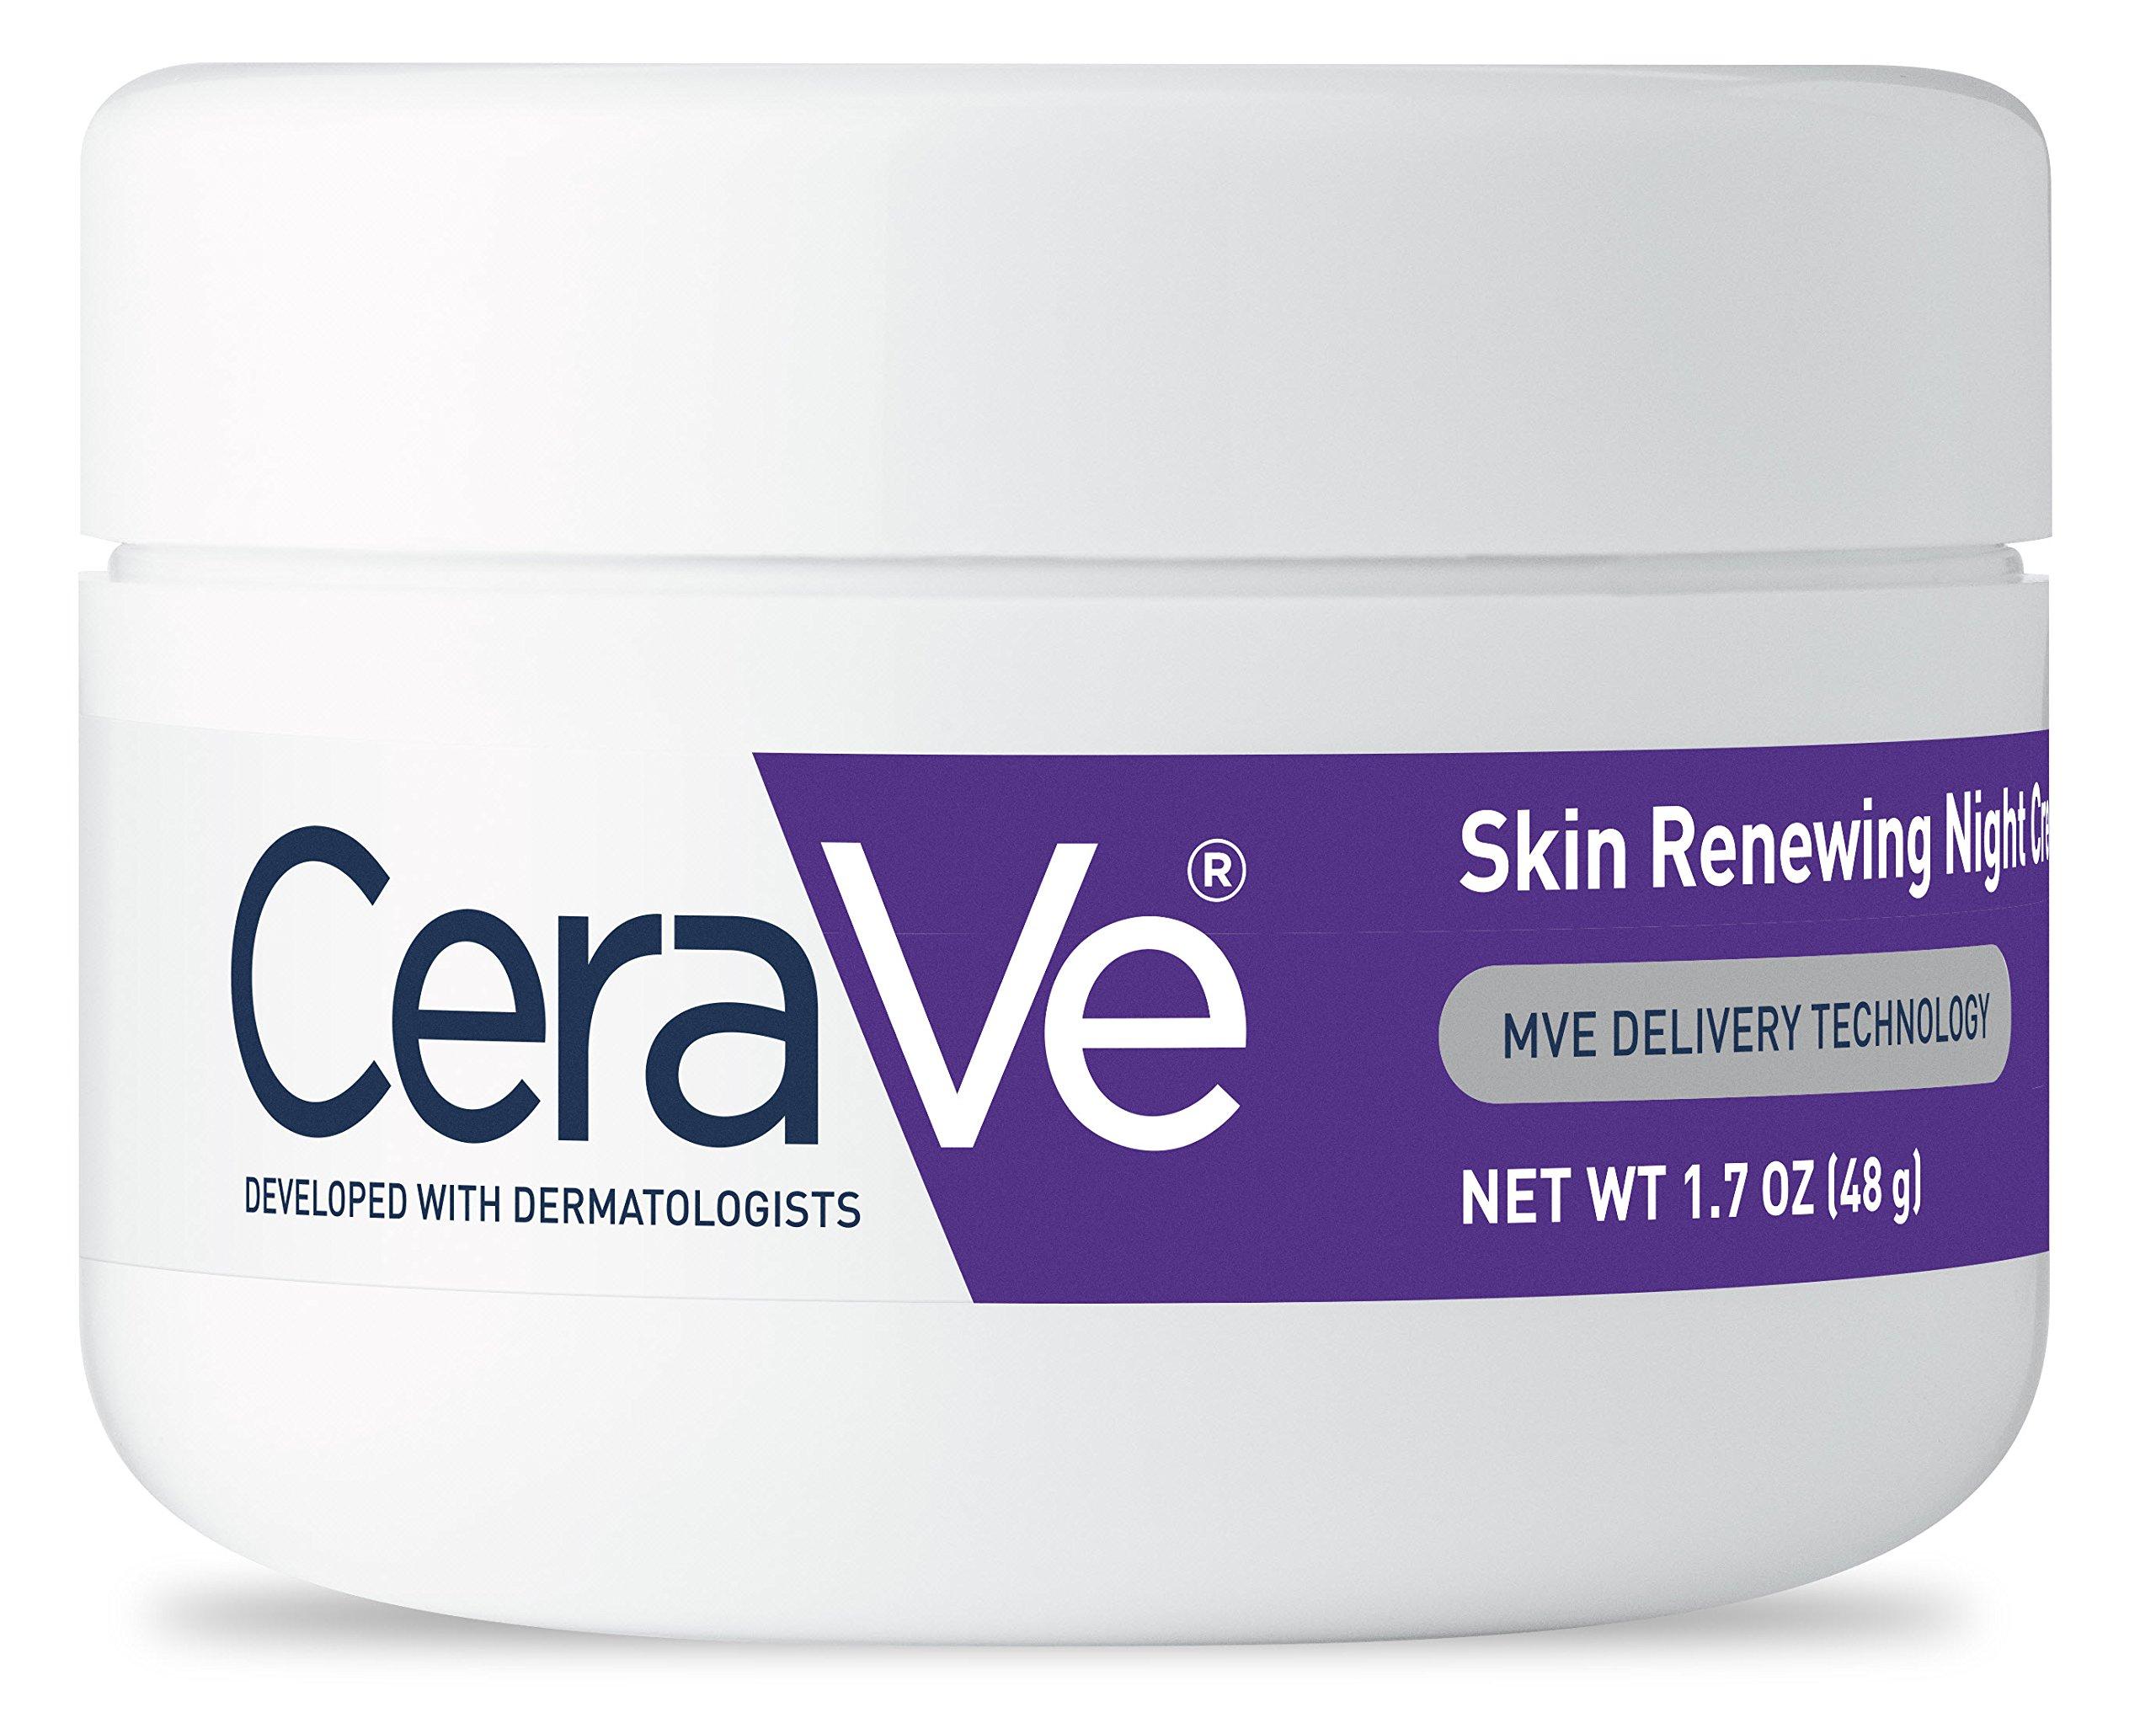 CeraVe Skin Renewing Night Cream - Multipurpose Night Cream, Face Moisturizer, Anti Aging Face Cream & Wrinkle Cream – Moisturizer for Face w Hyaluronic Acid & Niacinamide, 1.7 oz by CeraVe (Image #3)